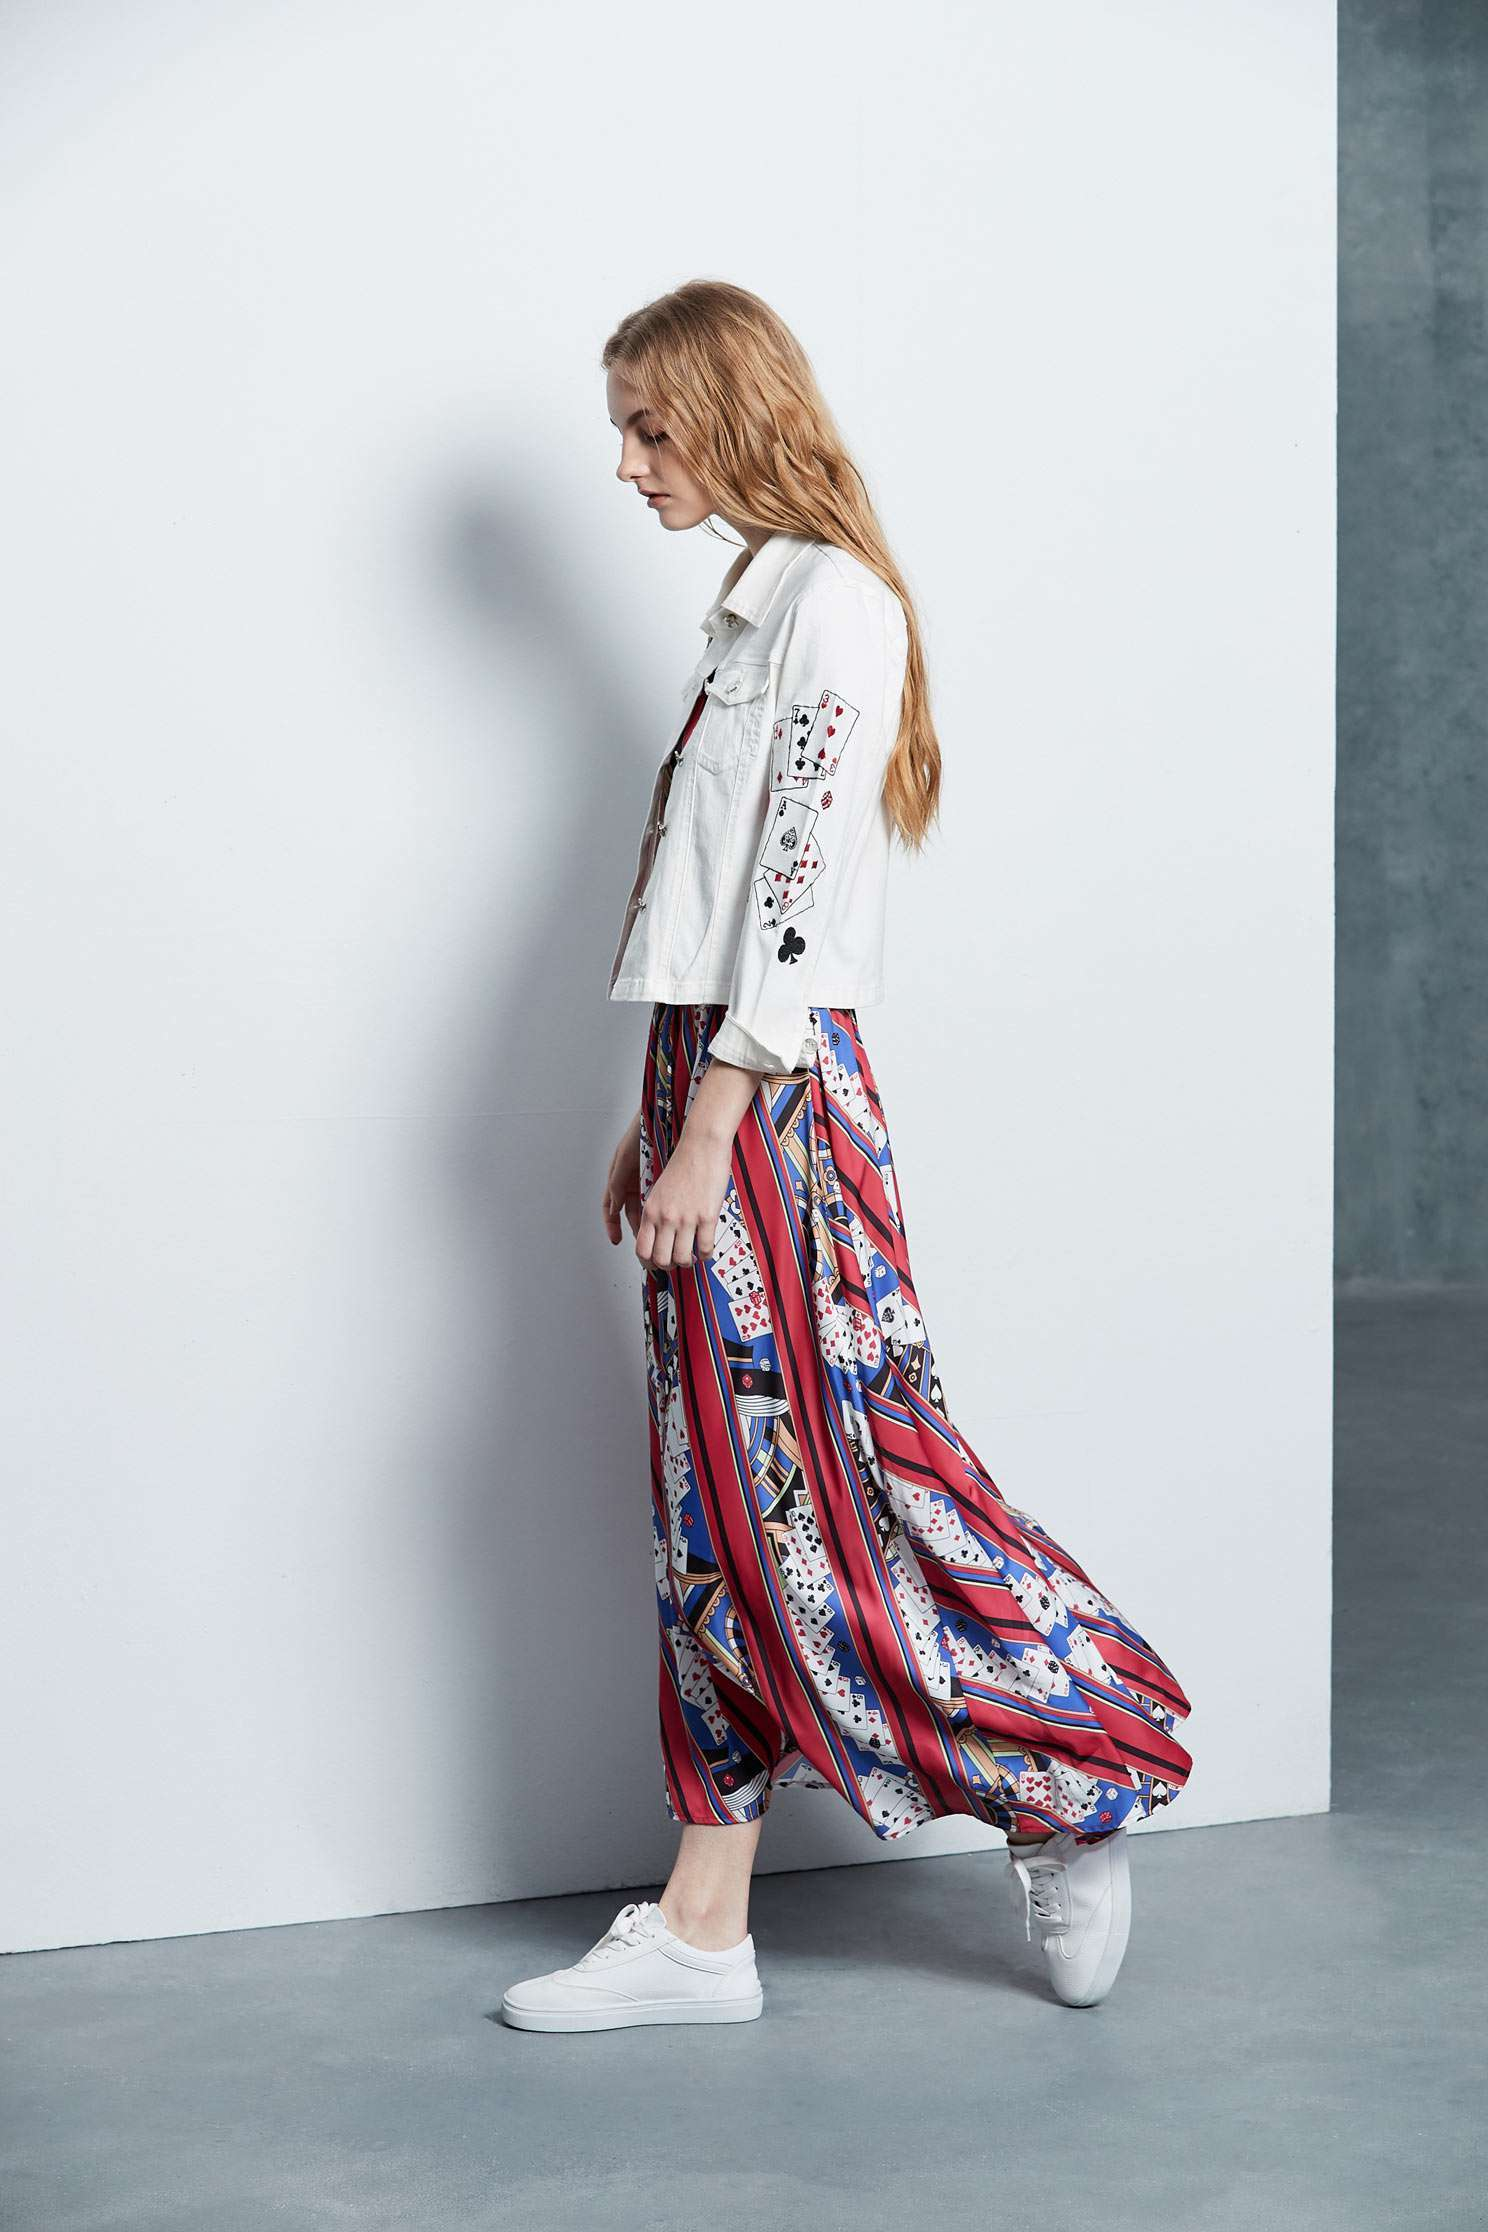 Elegant totem dress,dress,casualdress,printeddress,sleevelessdress